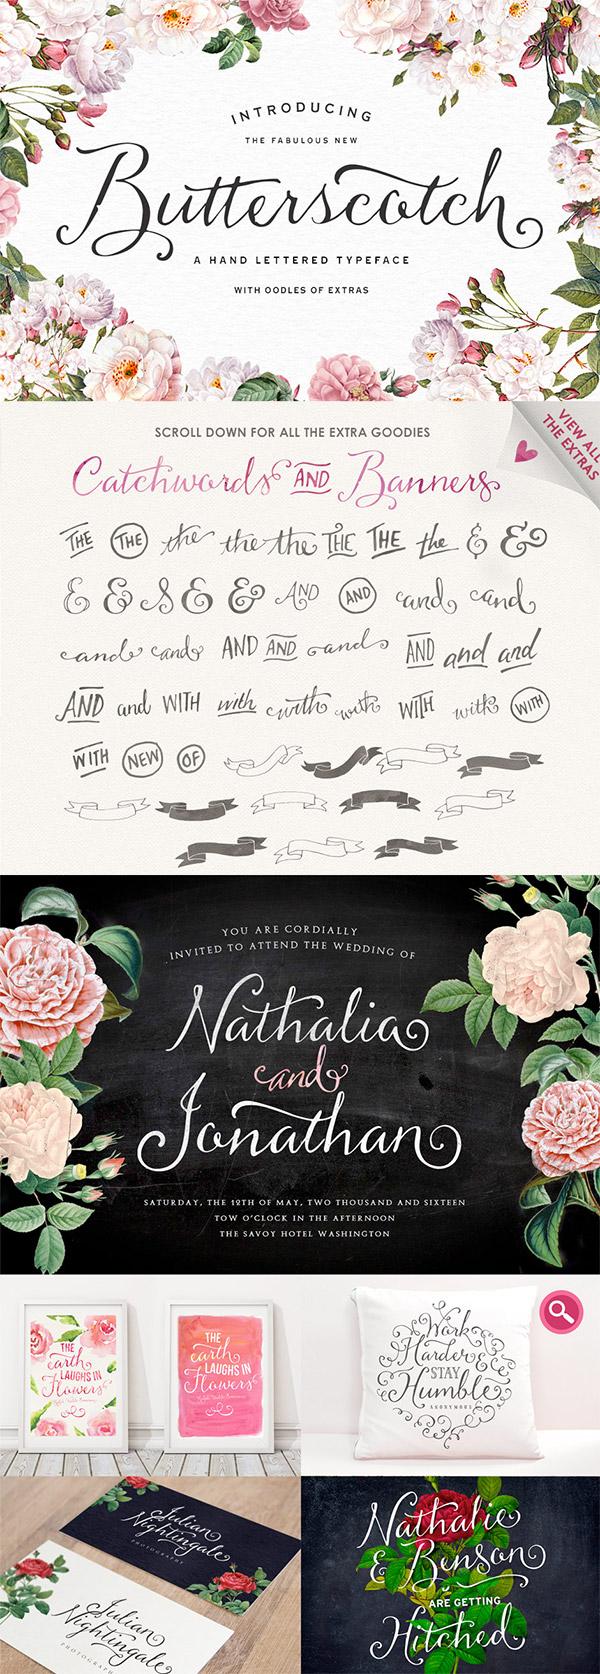 Butterscotch Typeface